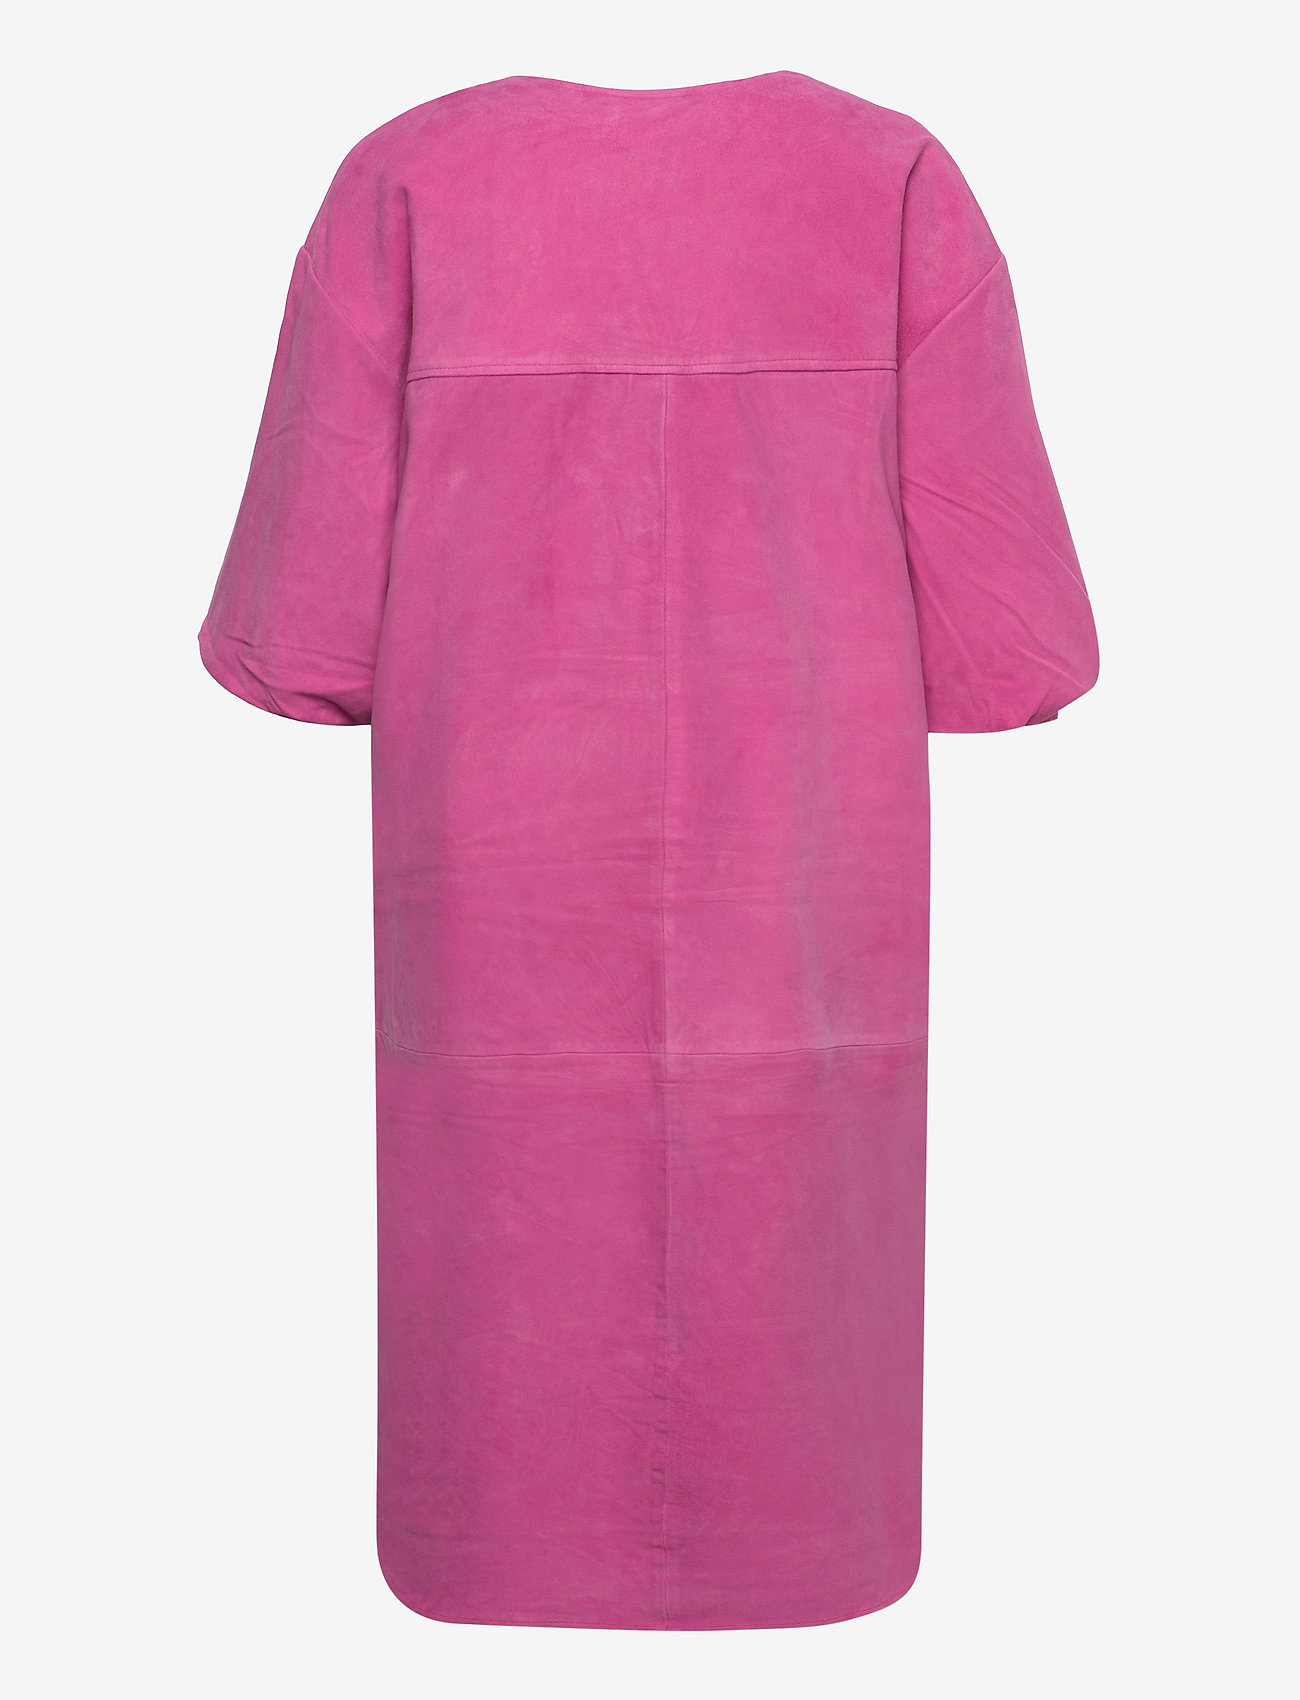 Selected Femme - SLFVANESSA 2/4 LEATHER SHIRT DRESS - alltagskleider - rose violet - 1